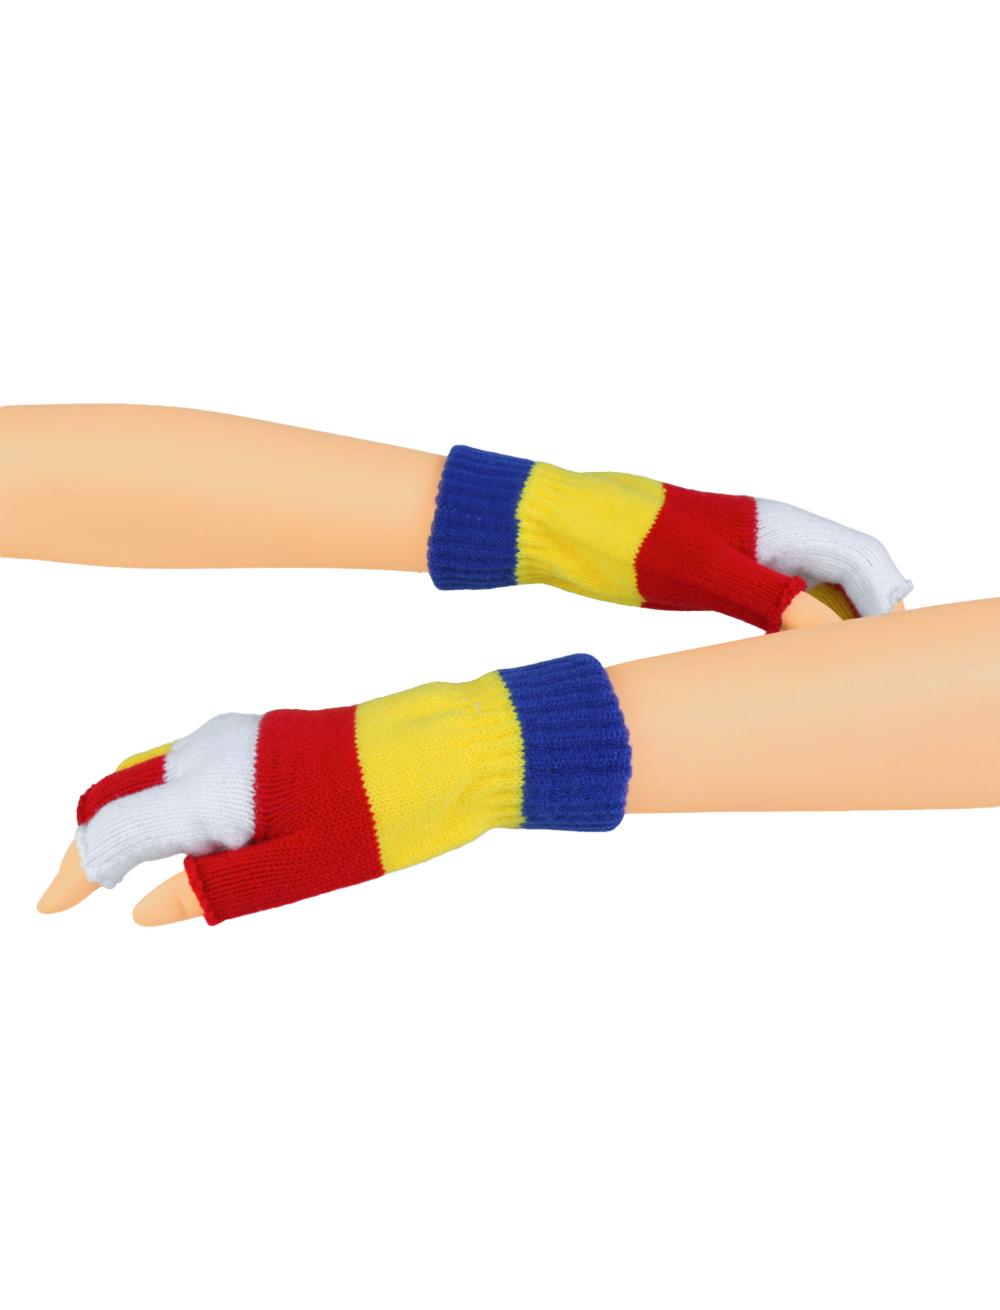 Kostuemzubehor Strickhandschuhe fingerlos rot/weiss/blau/gelb